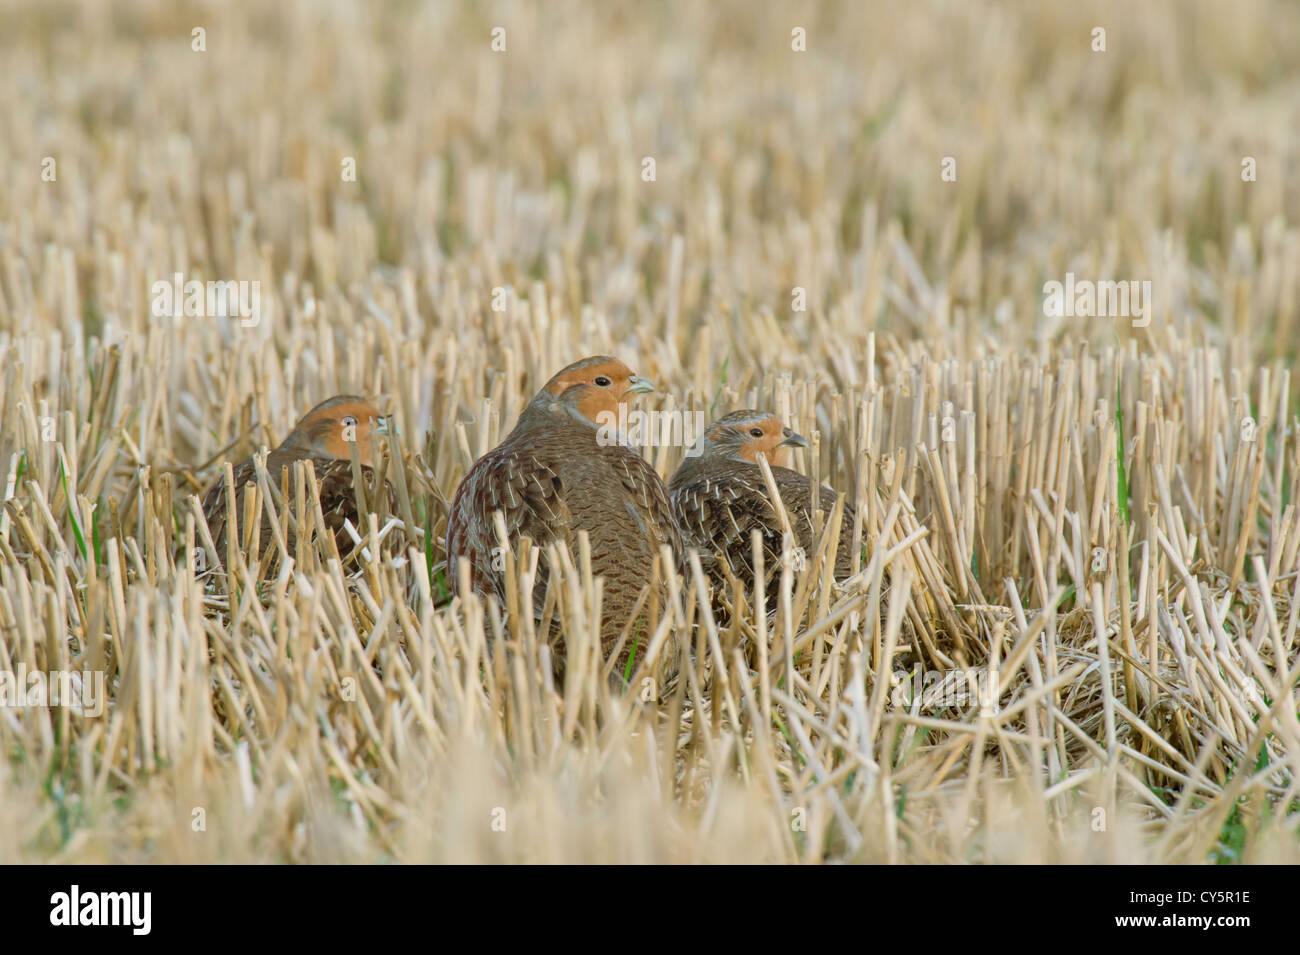 Grey Partridge(Perdix perdix) family in a Norfolk stubble field. - Stock Image